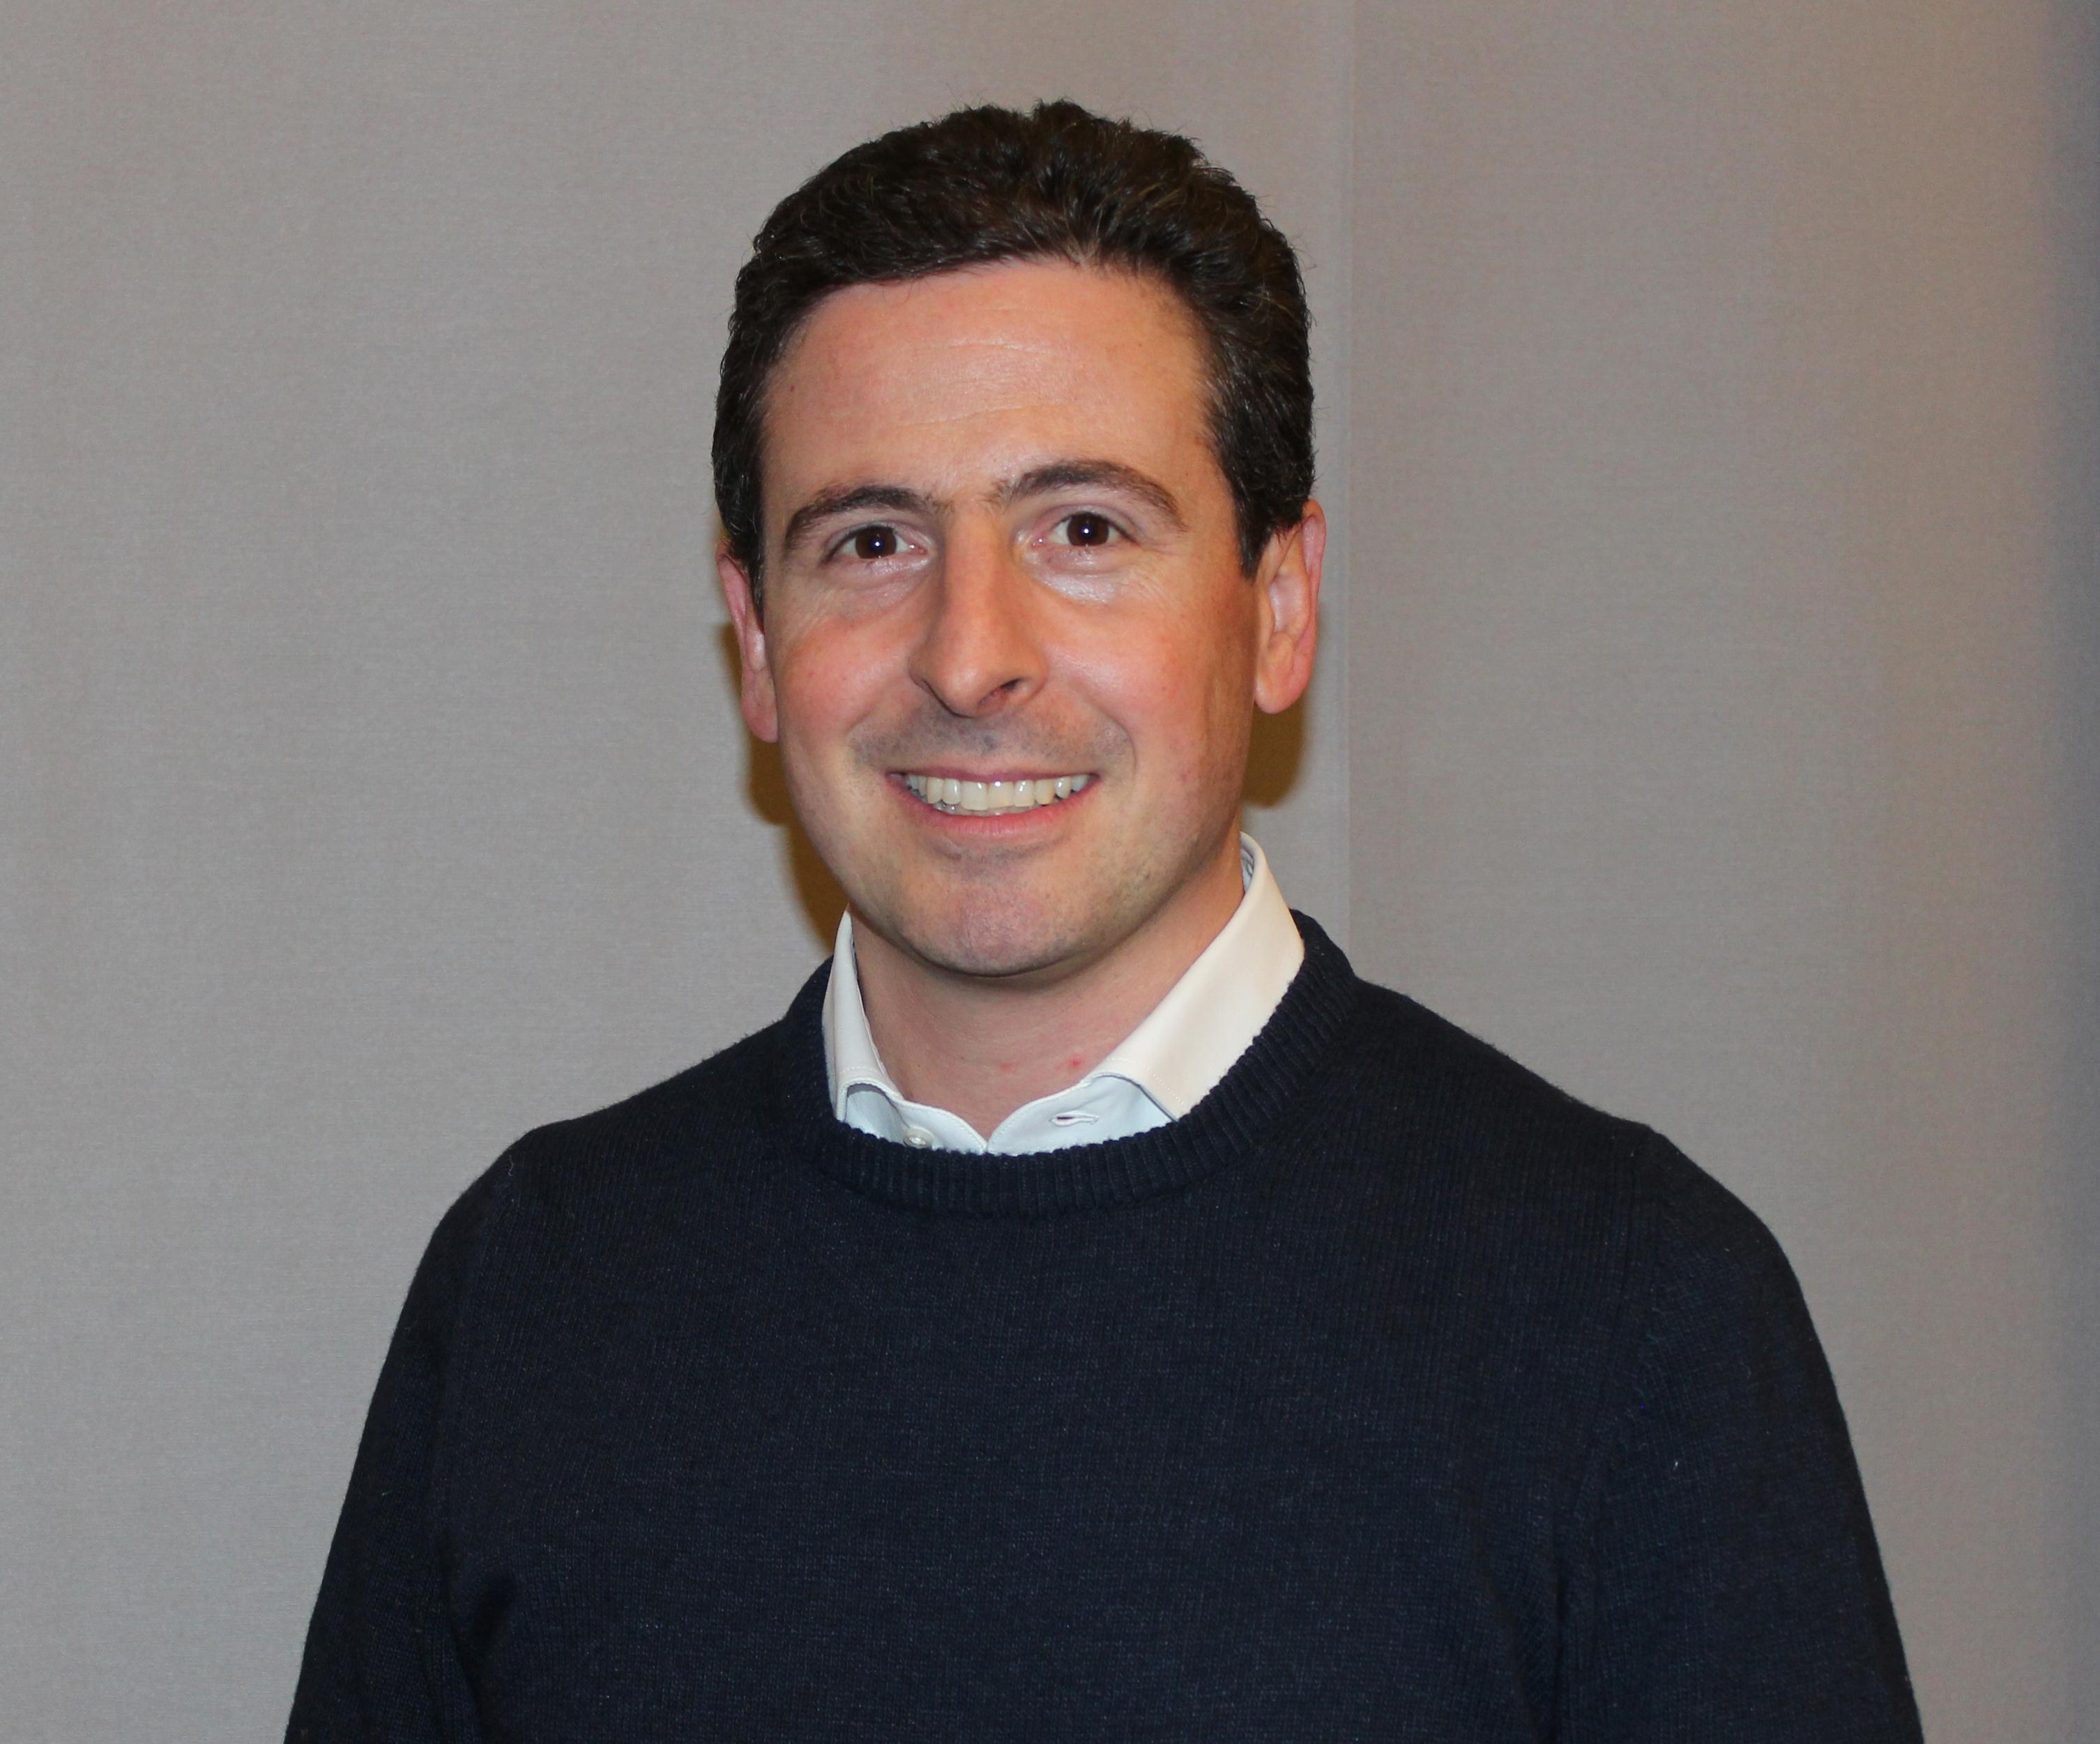 Tommaso Meacci, HR Business Partner di Benetton Group